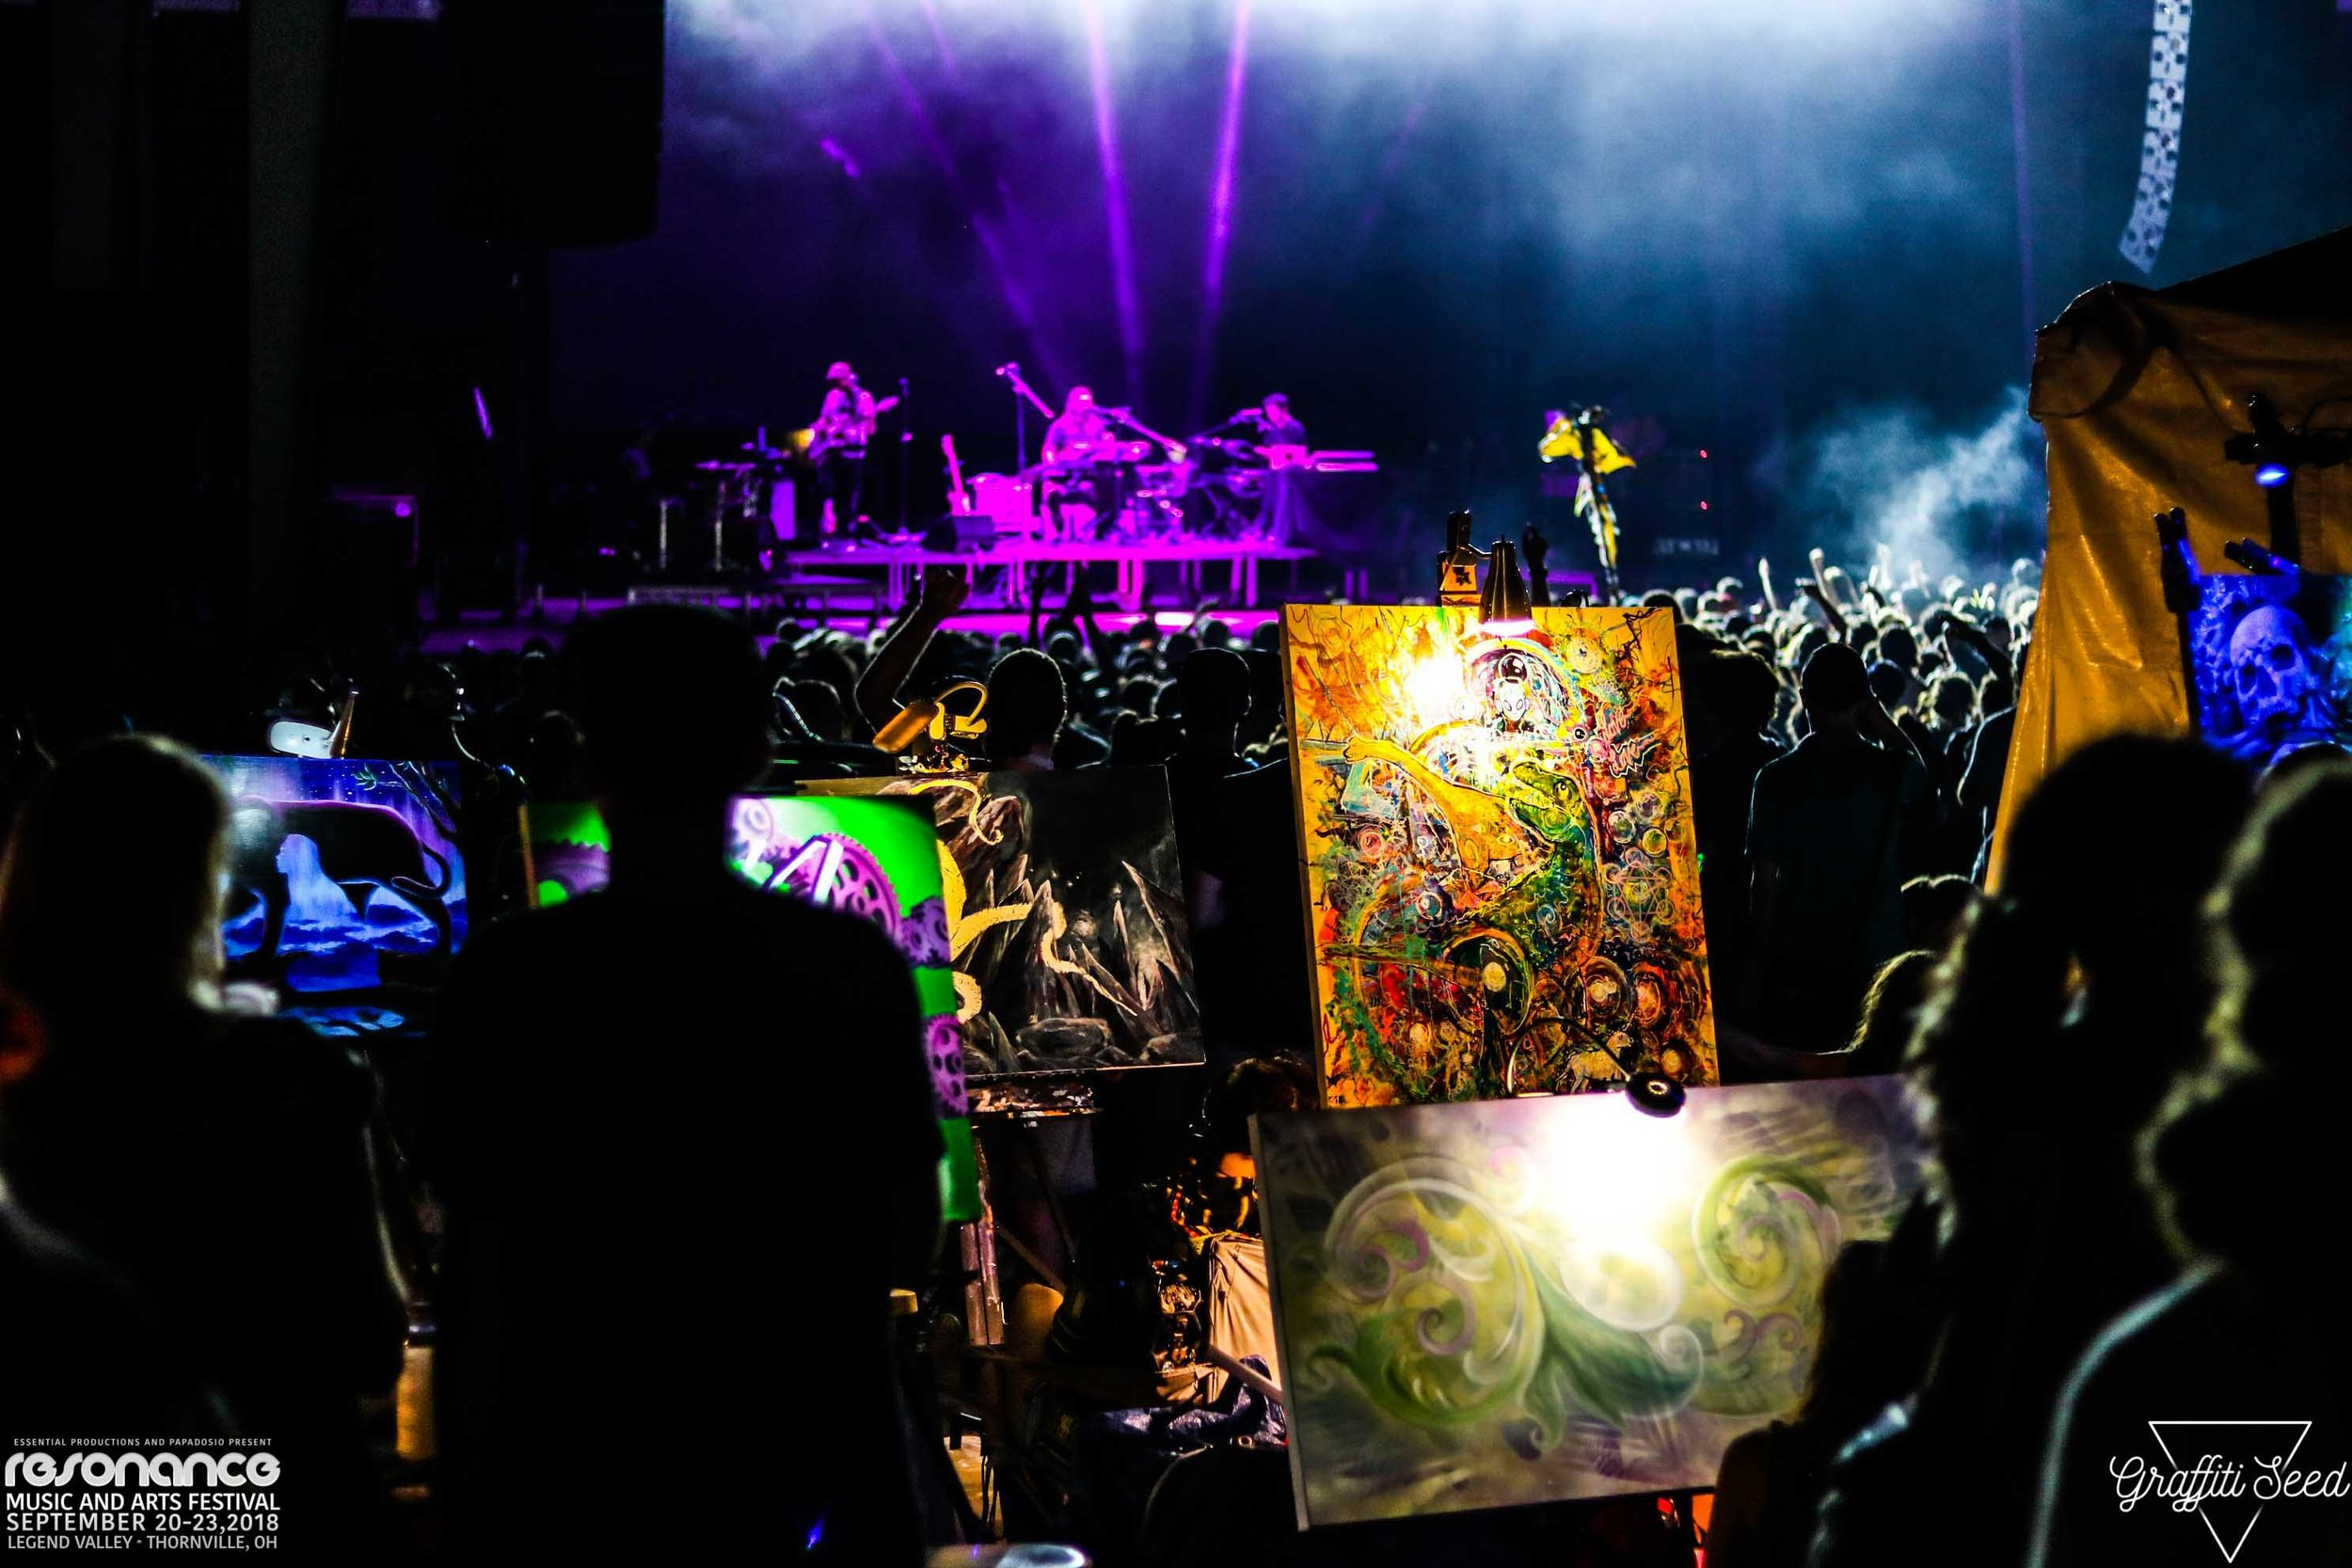 Resonance Music Festival 2018 _ www.GraffitiSeed.com 131.jpg